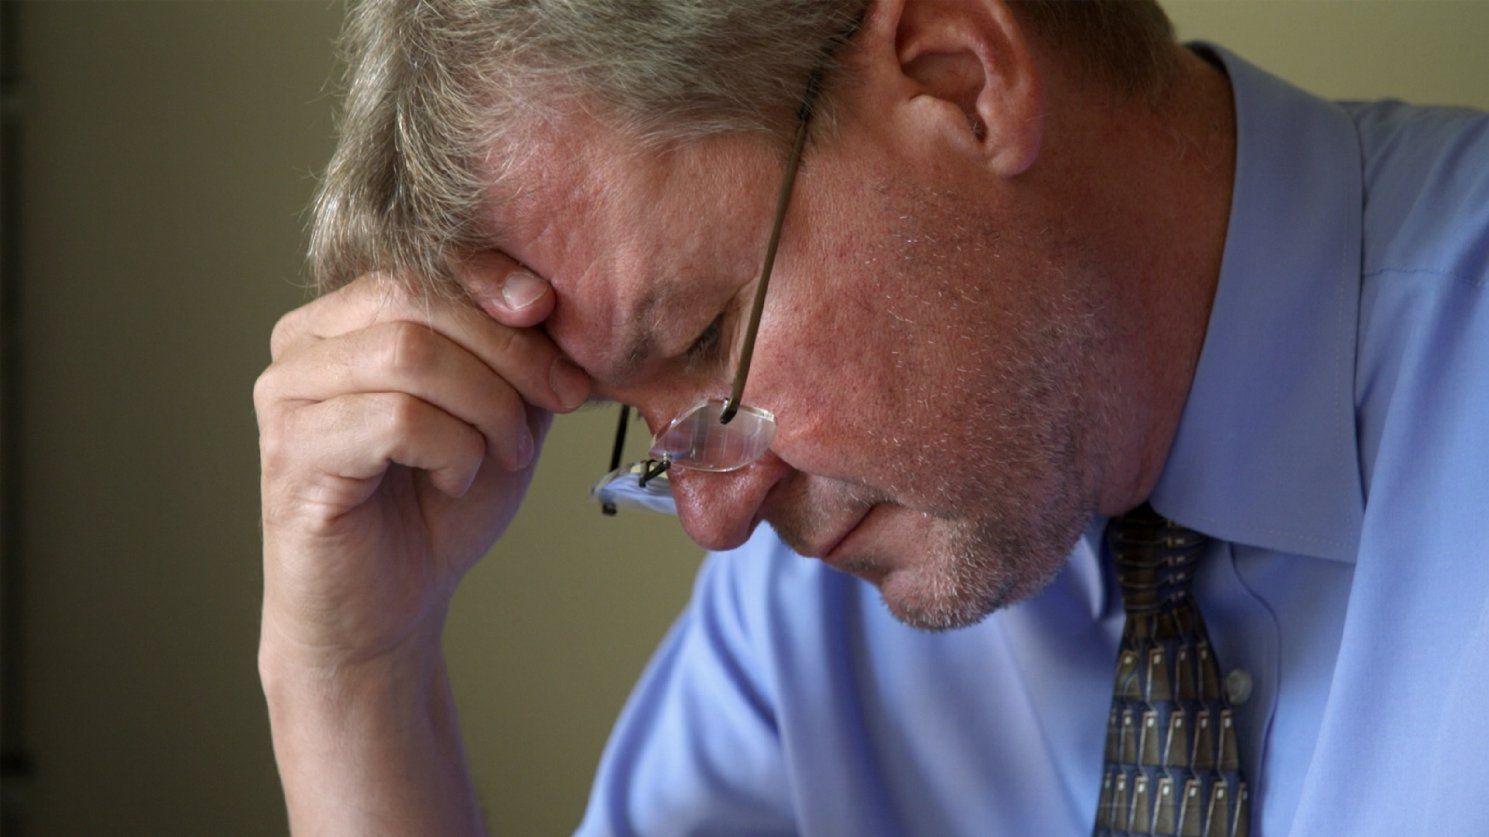 Pastor Jay Reinke feels the pressures